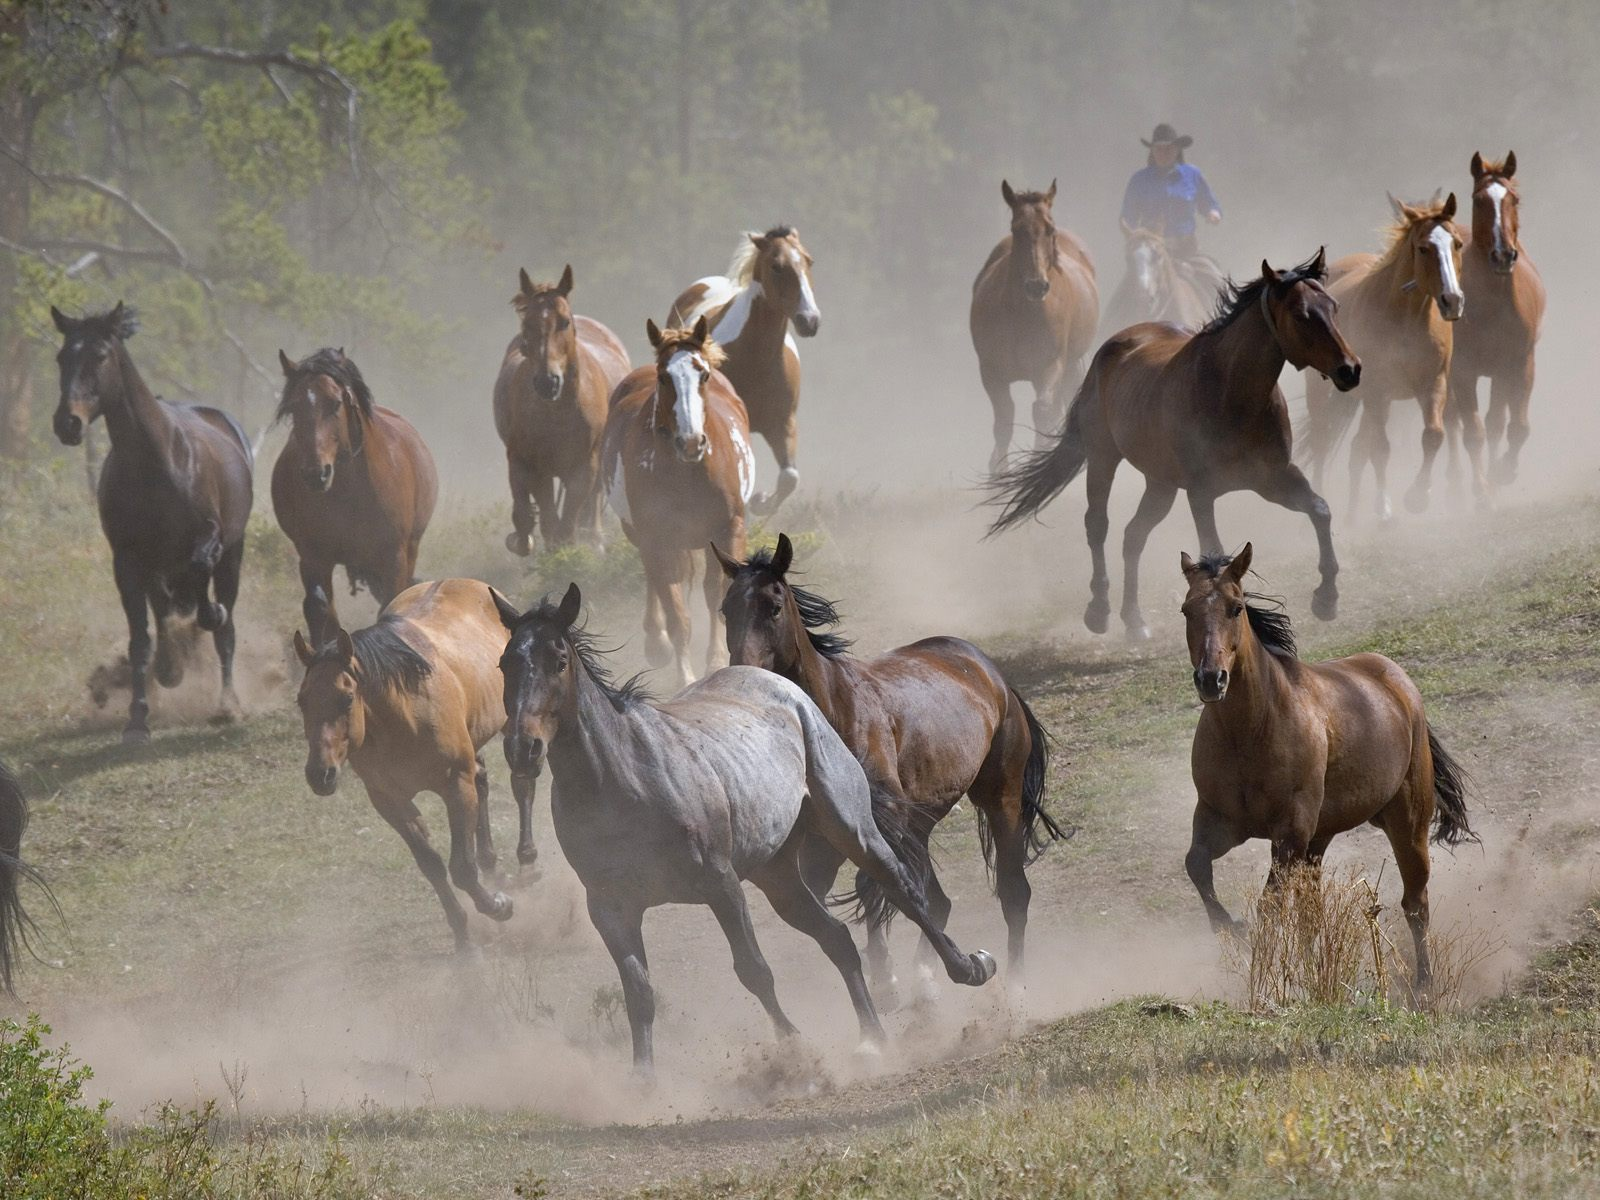 wild horses running wallpapers - photo #1